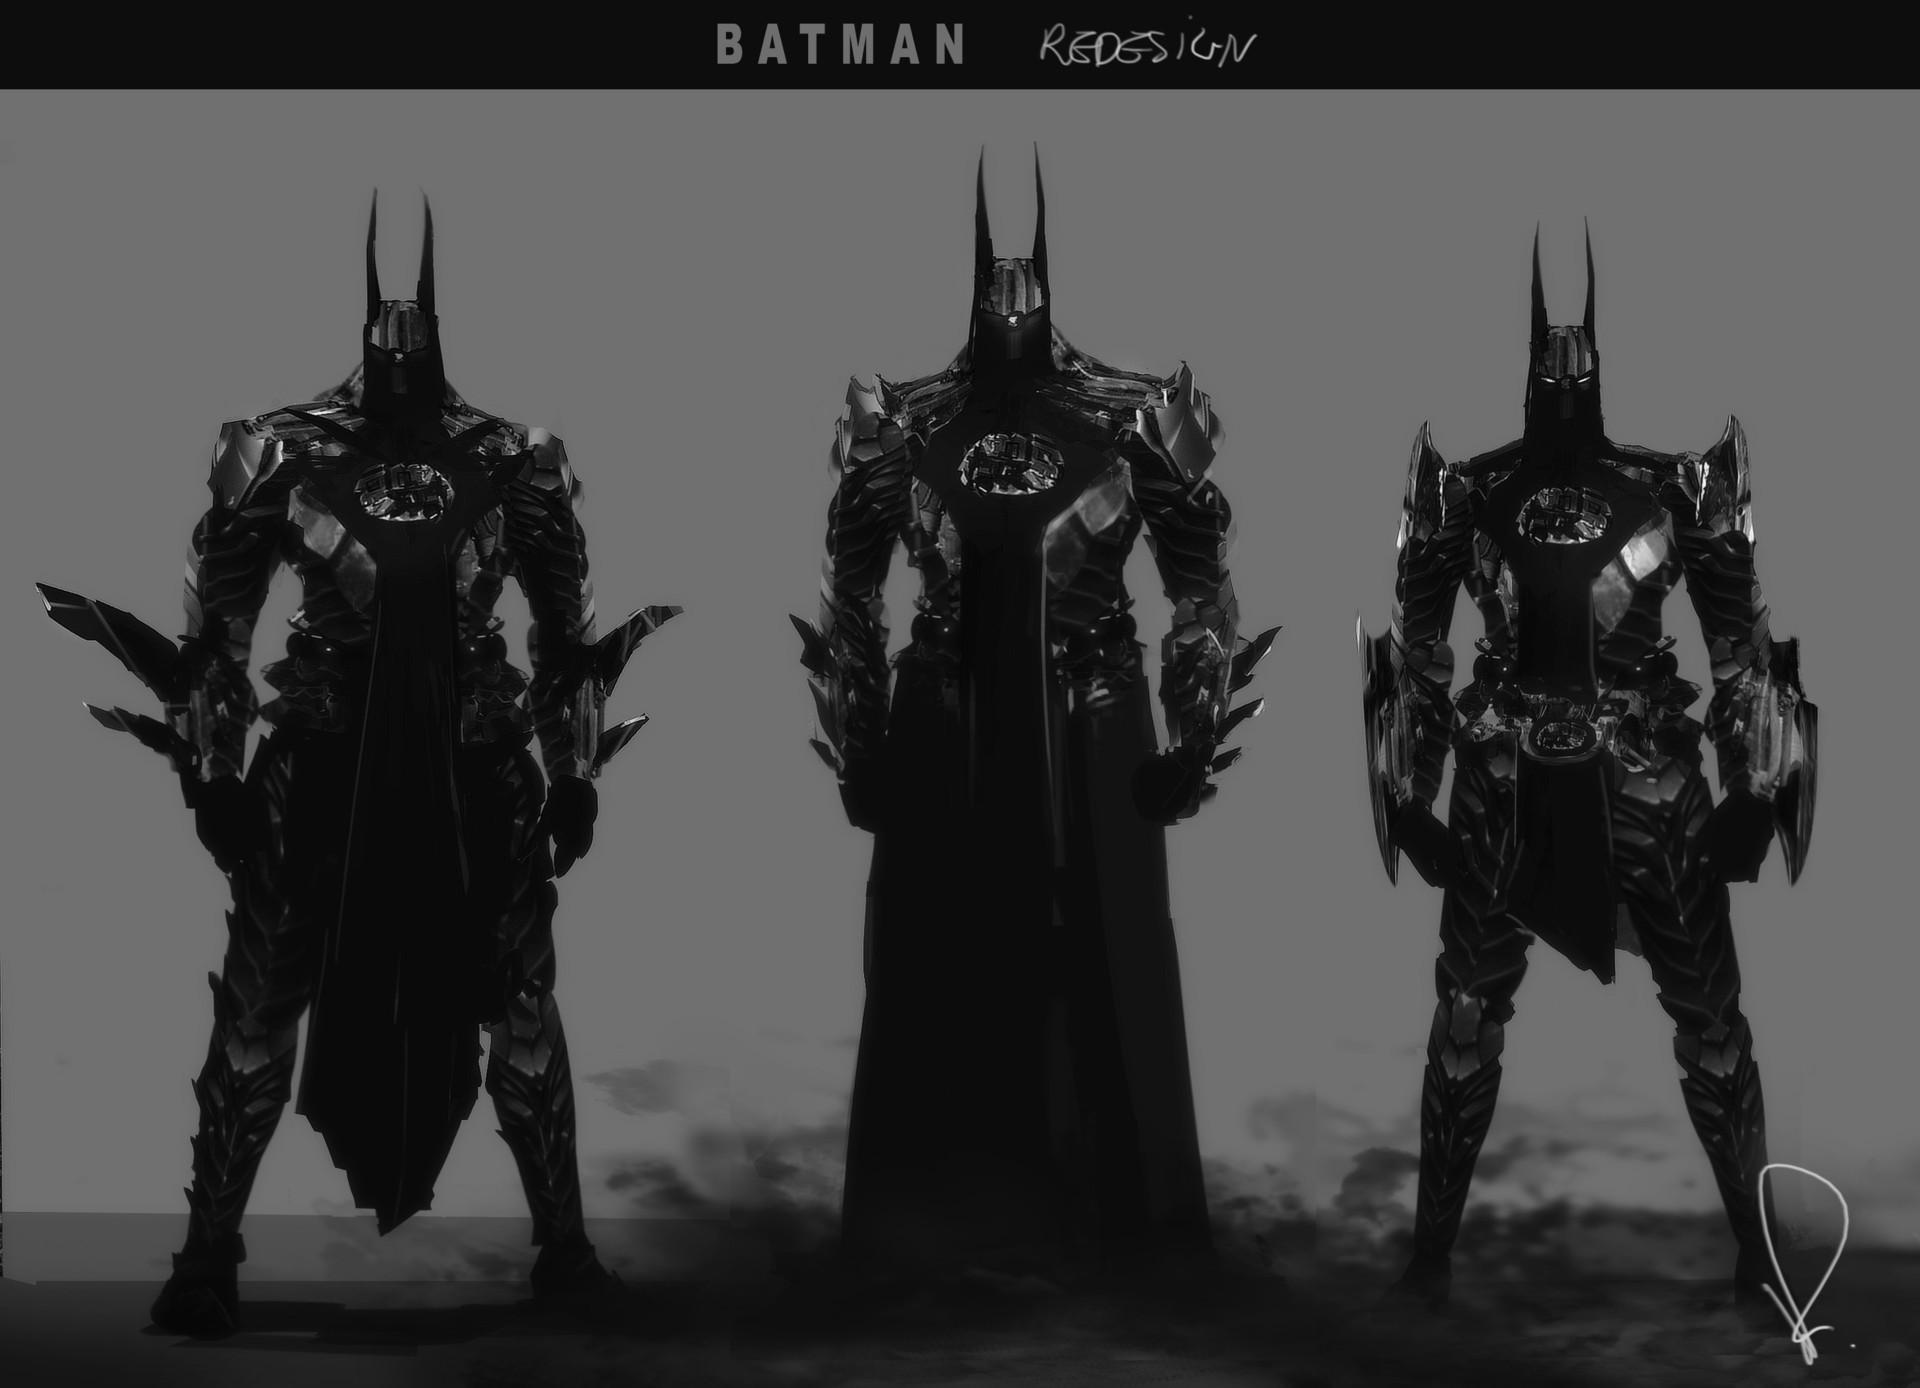 Marcin rubinkowski batman redesign scalone resize 1